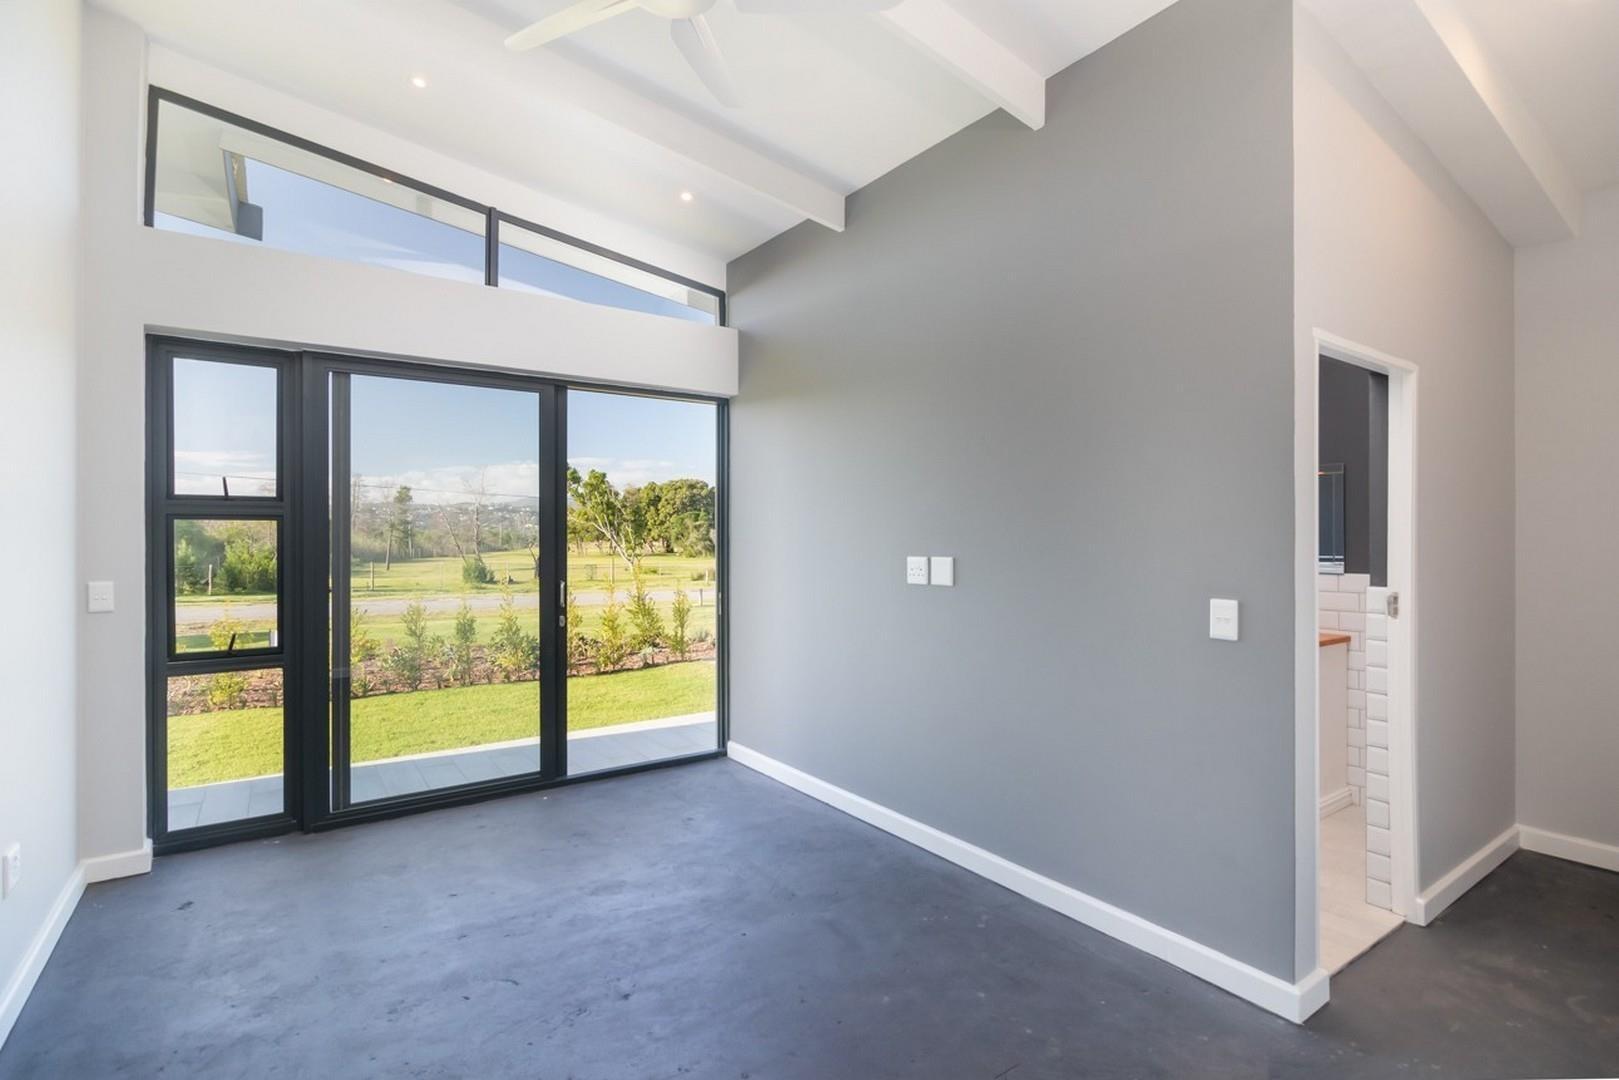 3 Bedroom House For Sale in Brenton On Lake